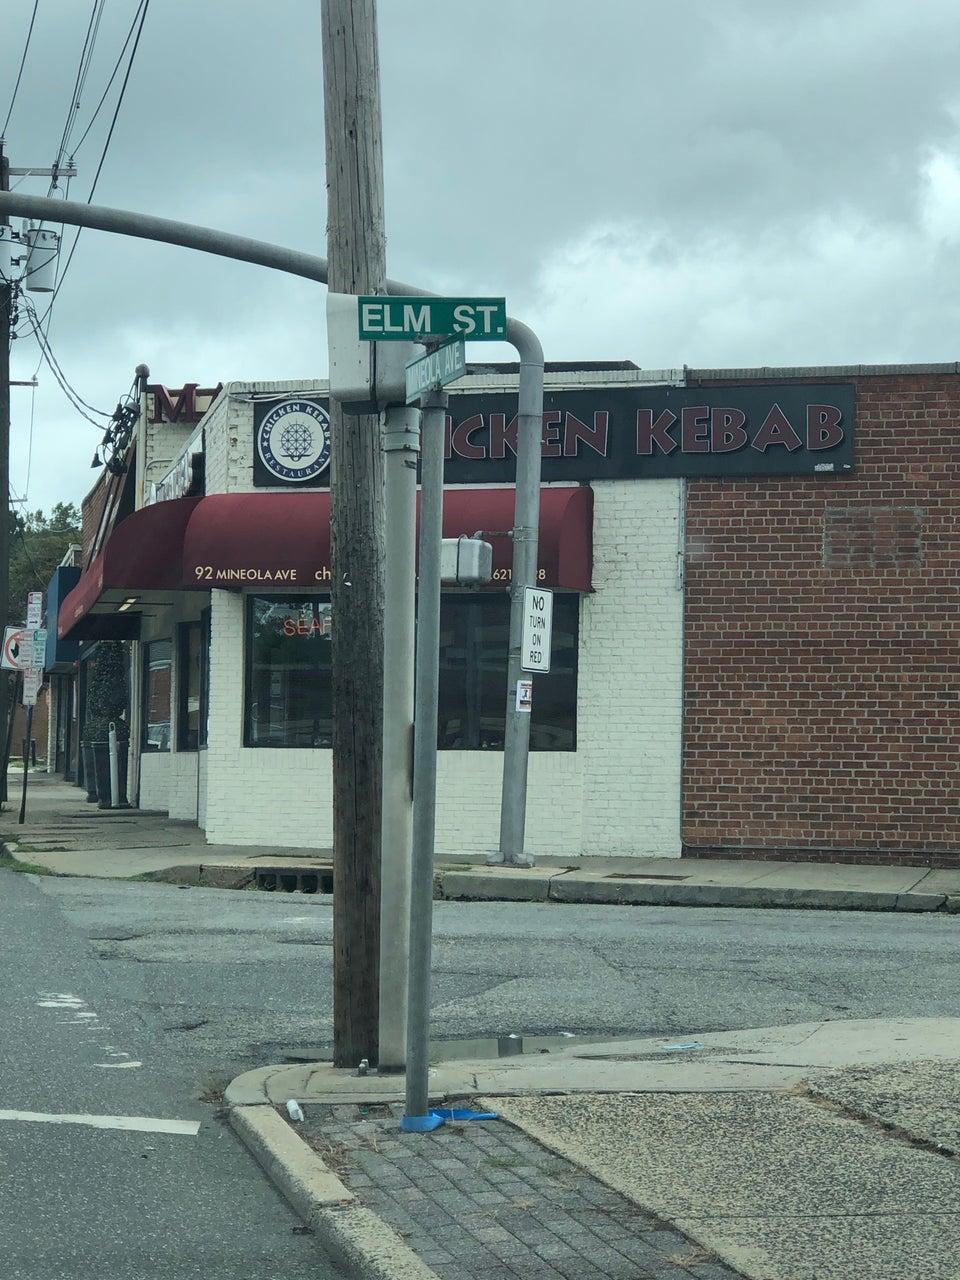 Best Local Restaurants In Roslyn Heights Ny Jul 2021 Restaurantji